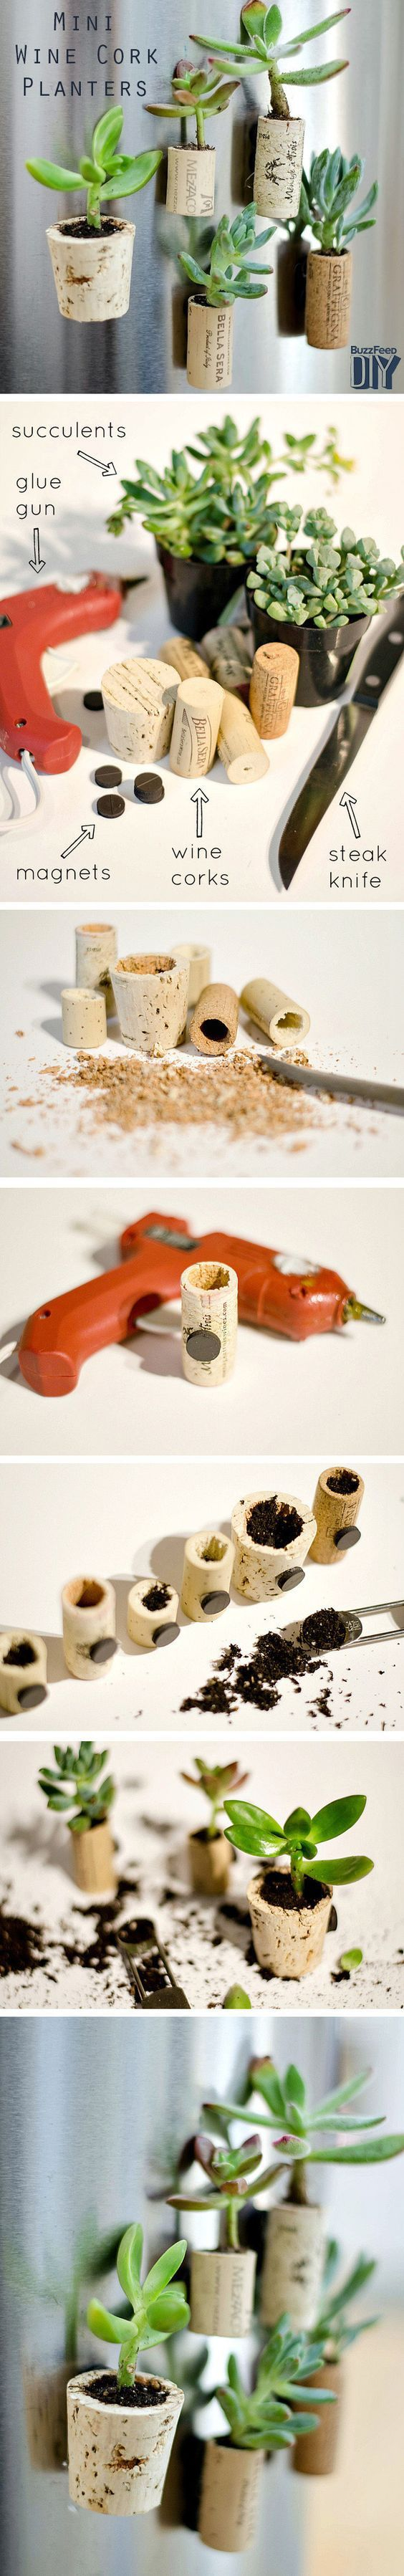 21 Spectacular DIY Wine Cork Crafts - Modern Healthy Life